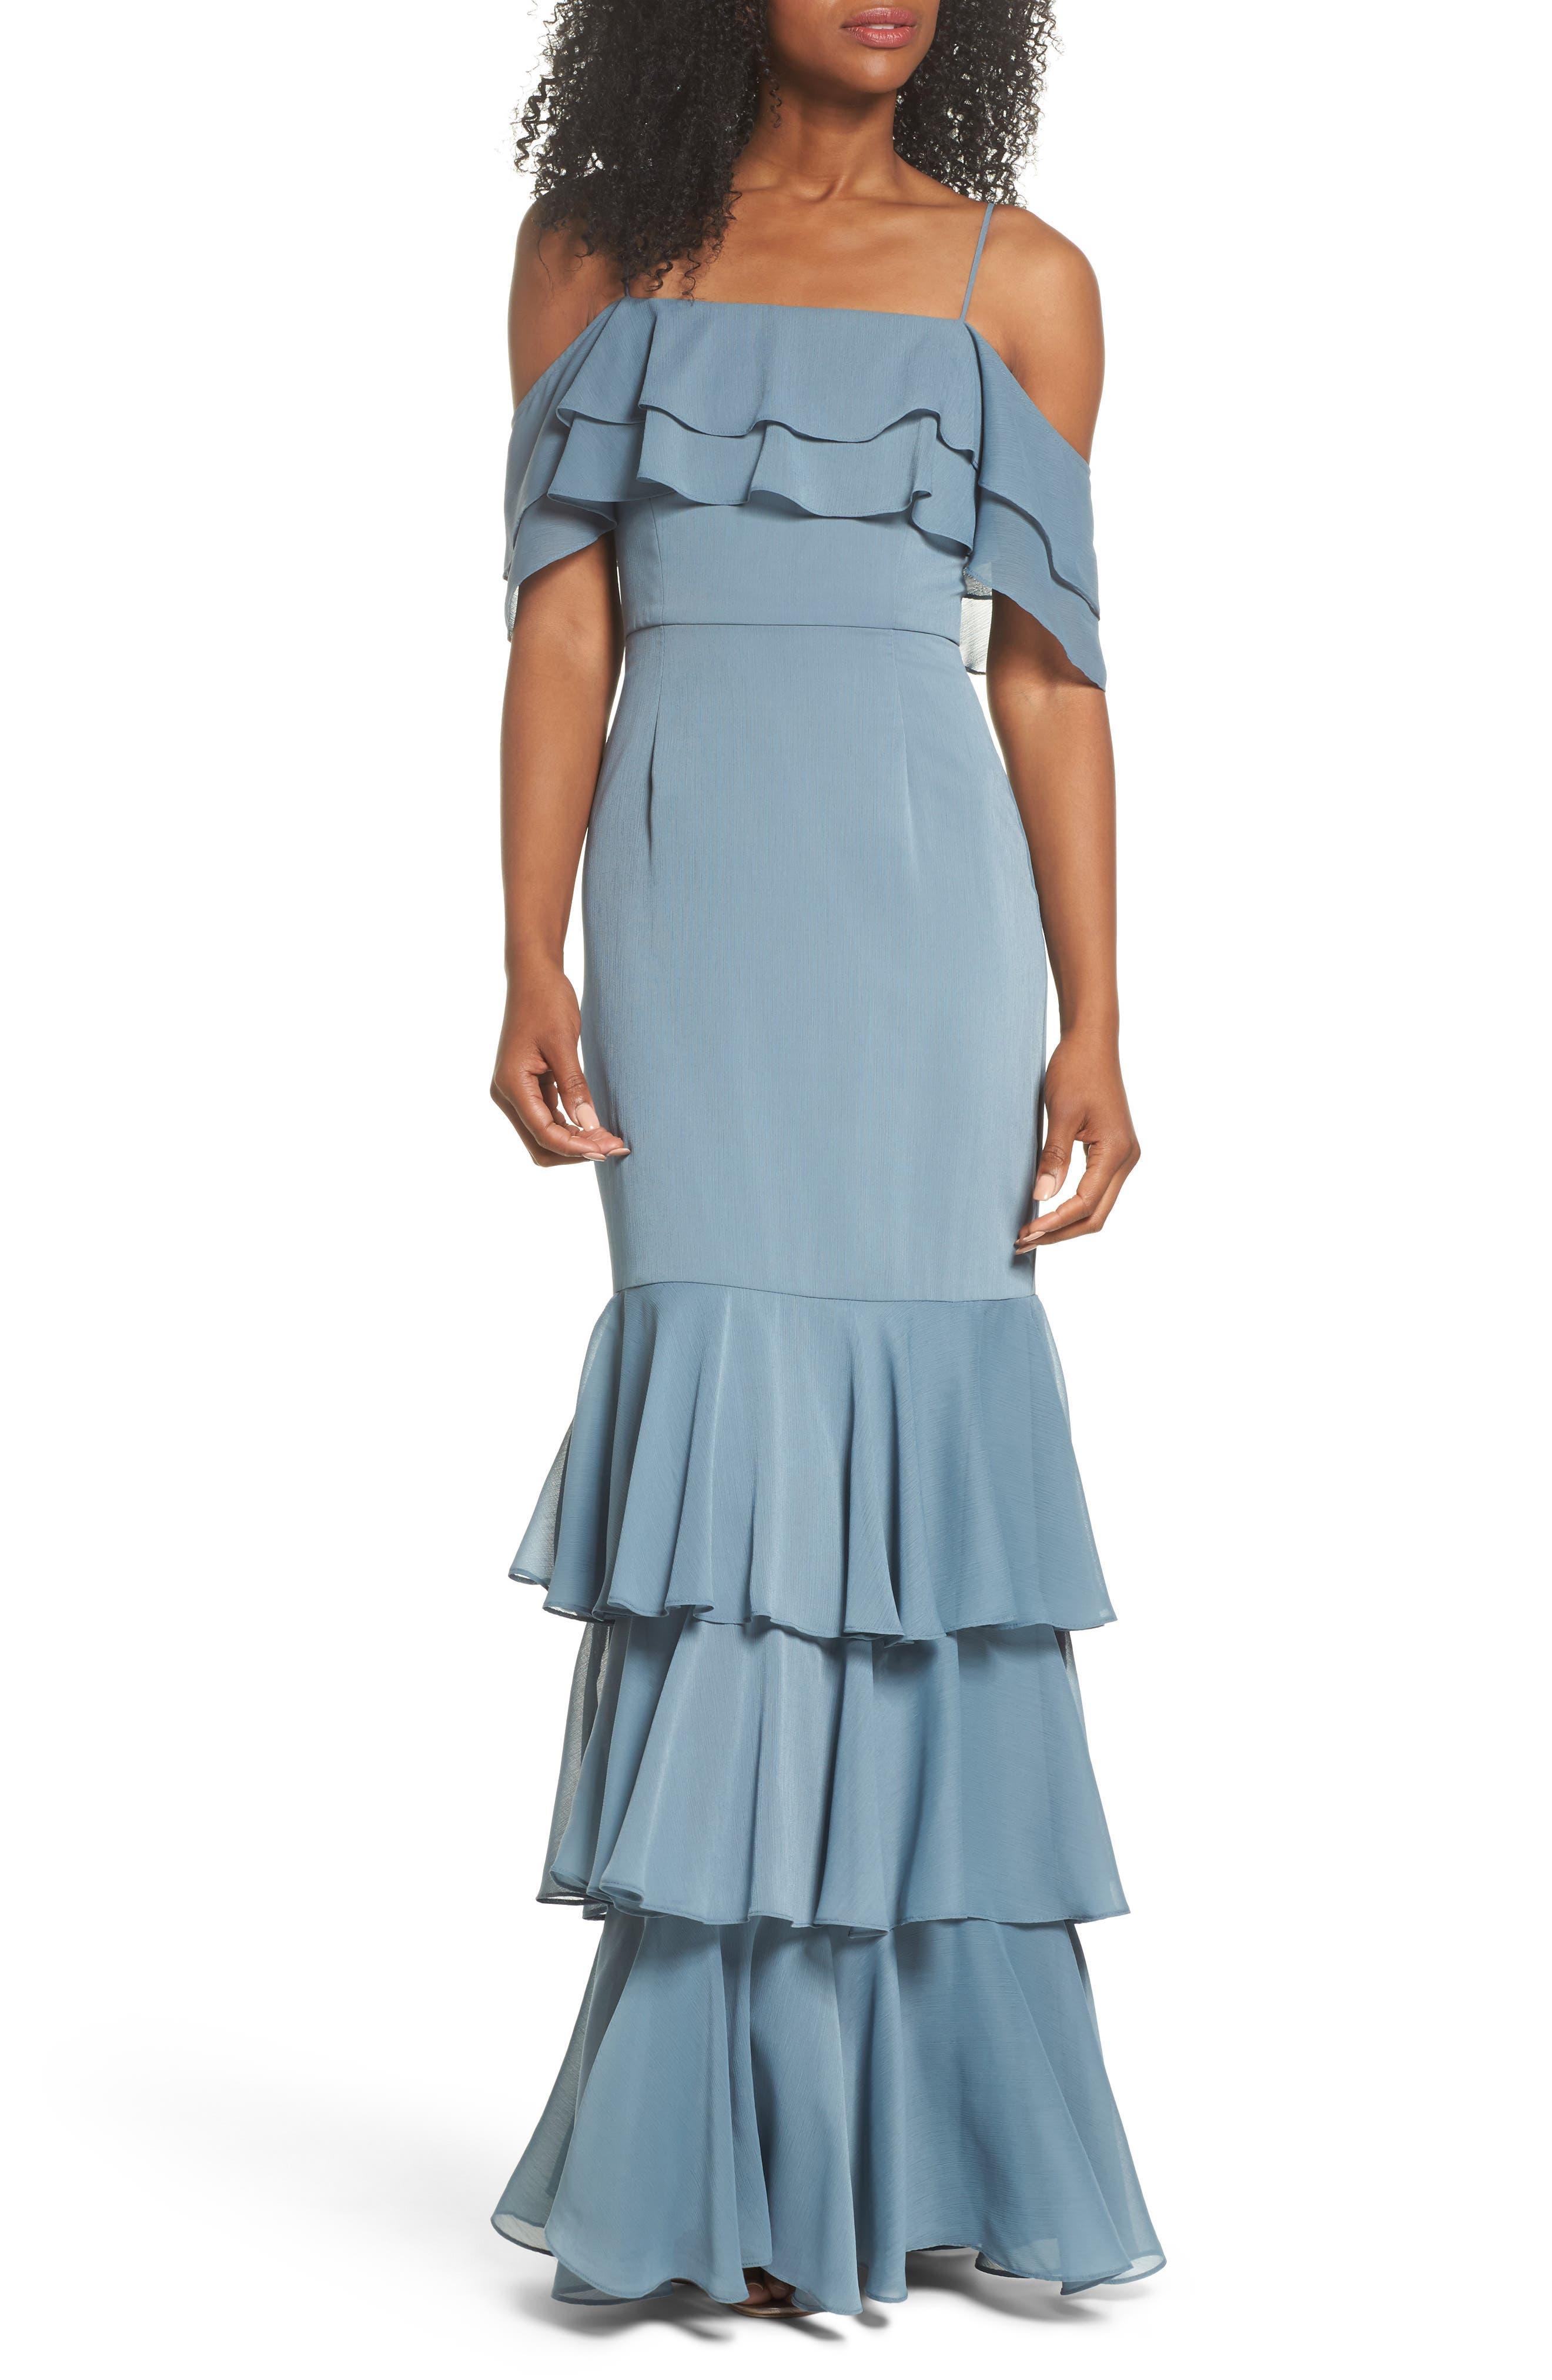 Lauren Cold Shoulder Tiered Gown,                             Main thumbnail 1, color,